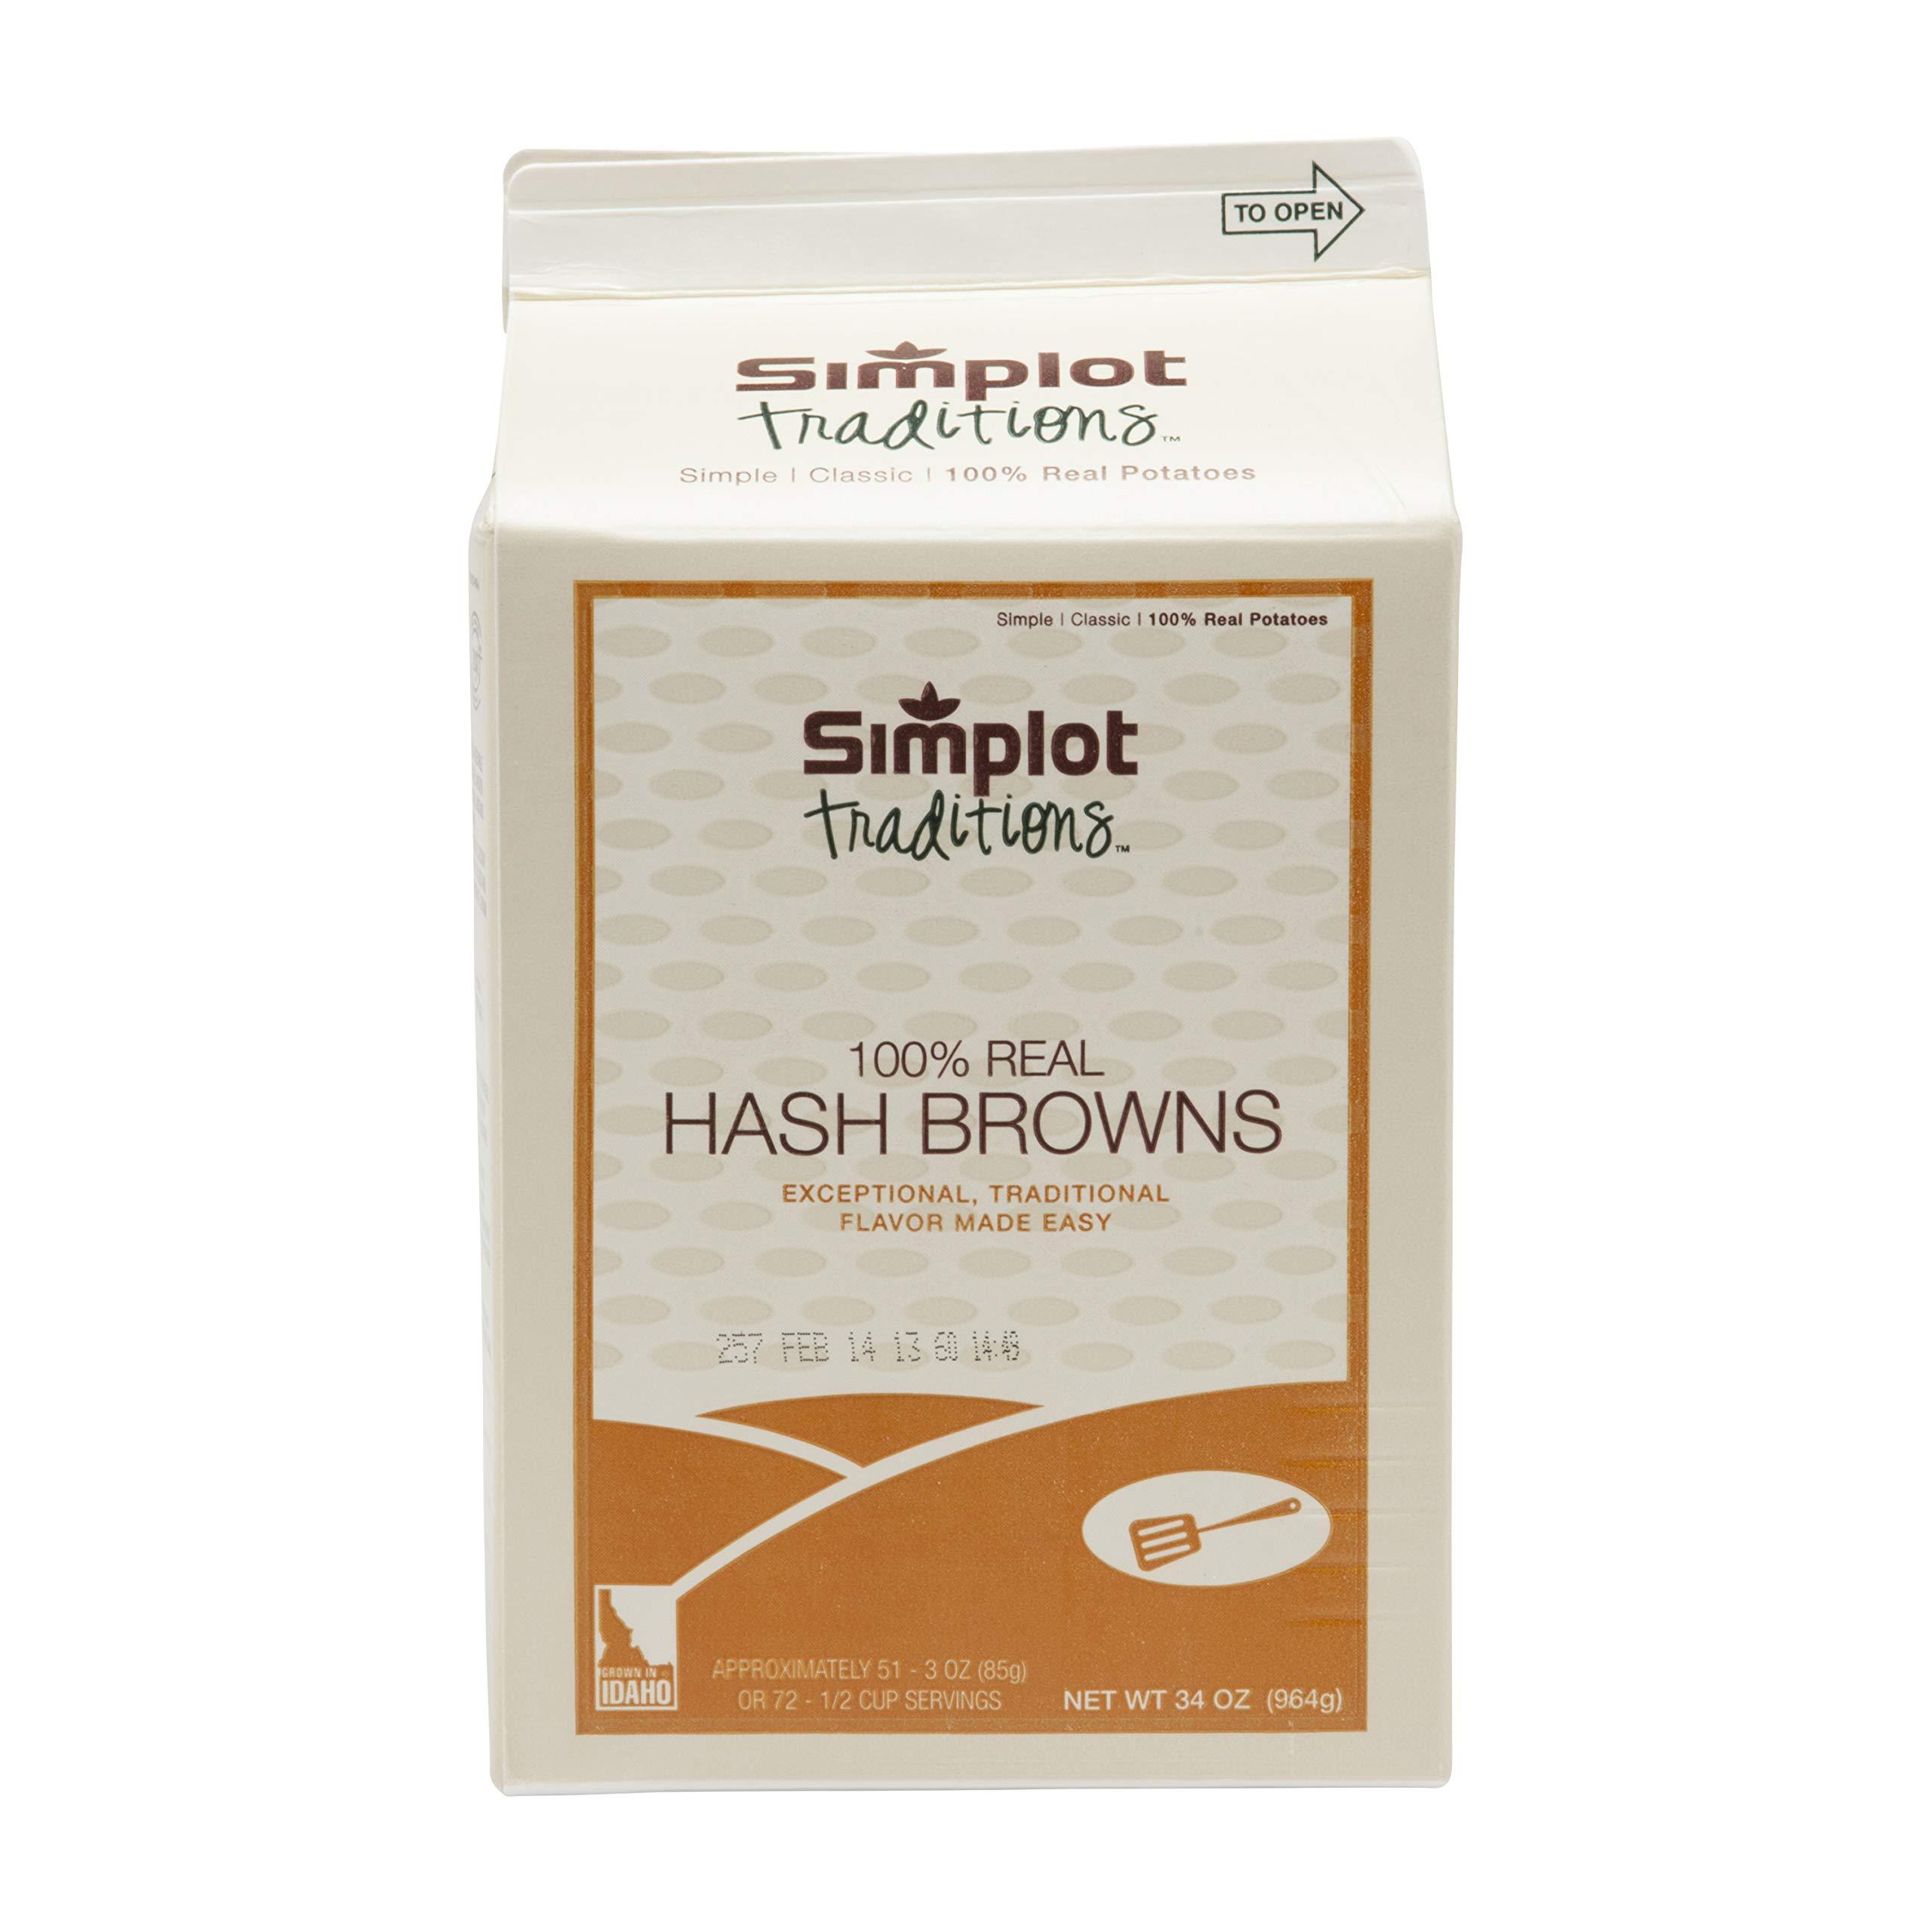 Simplot Traditions Hash Brown Potato Shreds, 2.12 Pound - 6 per case.